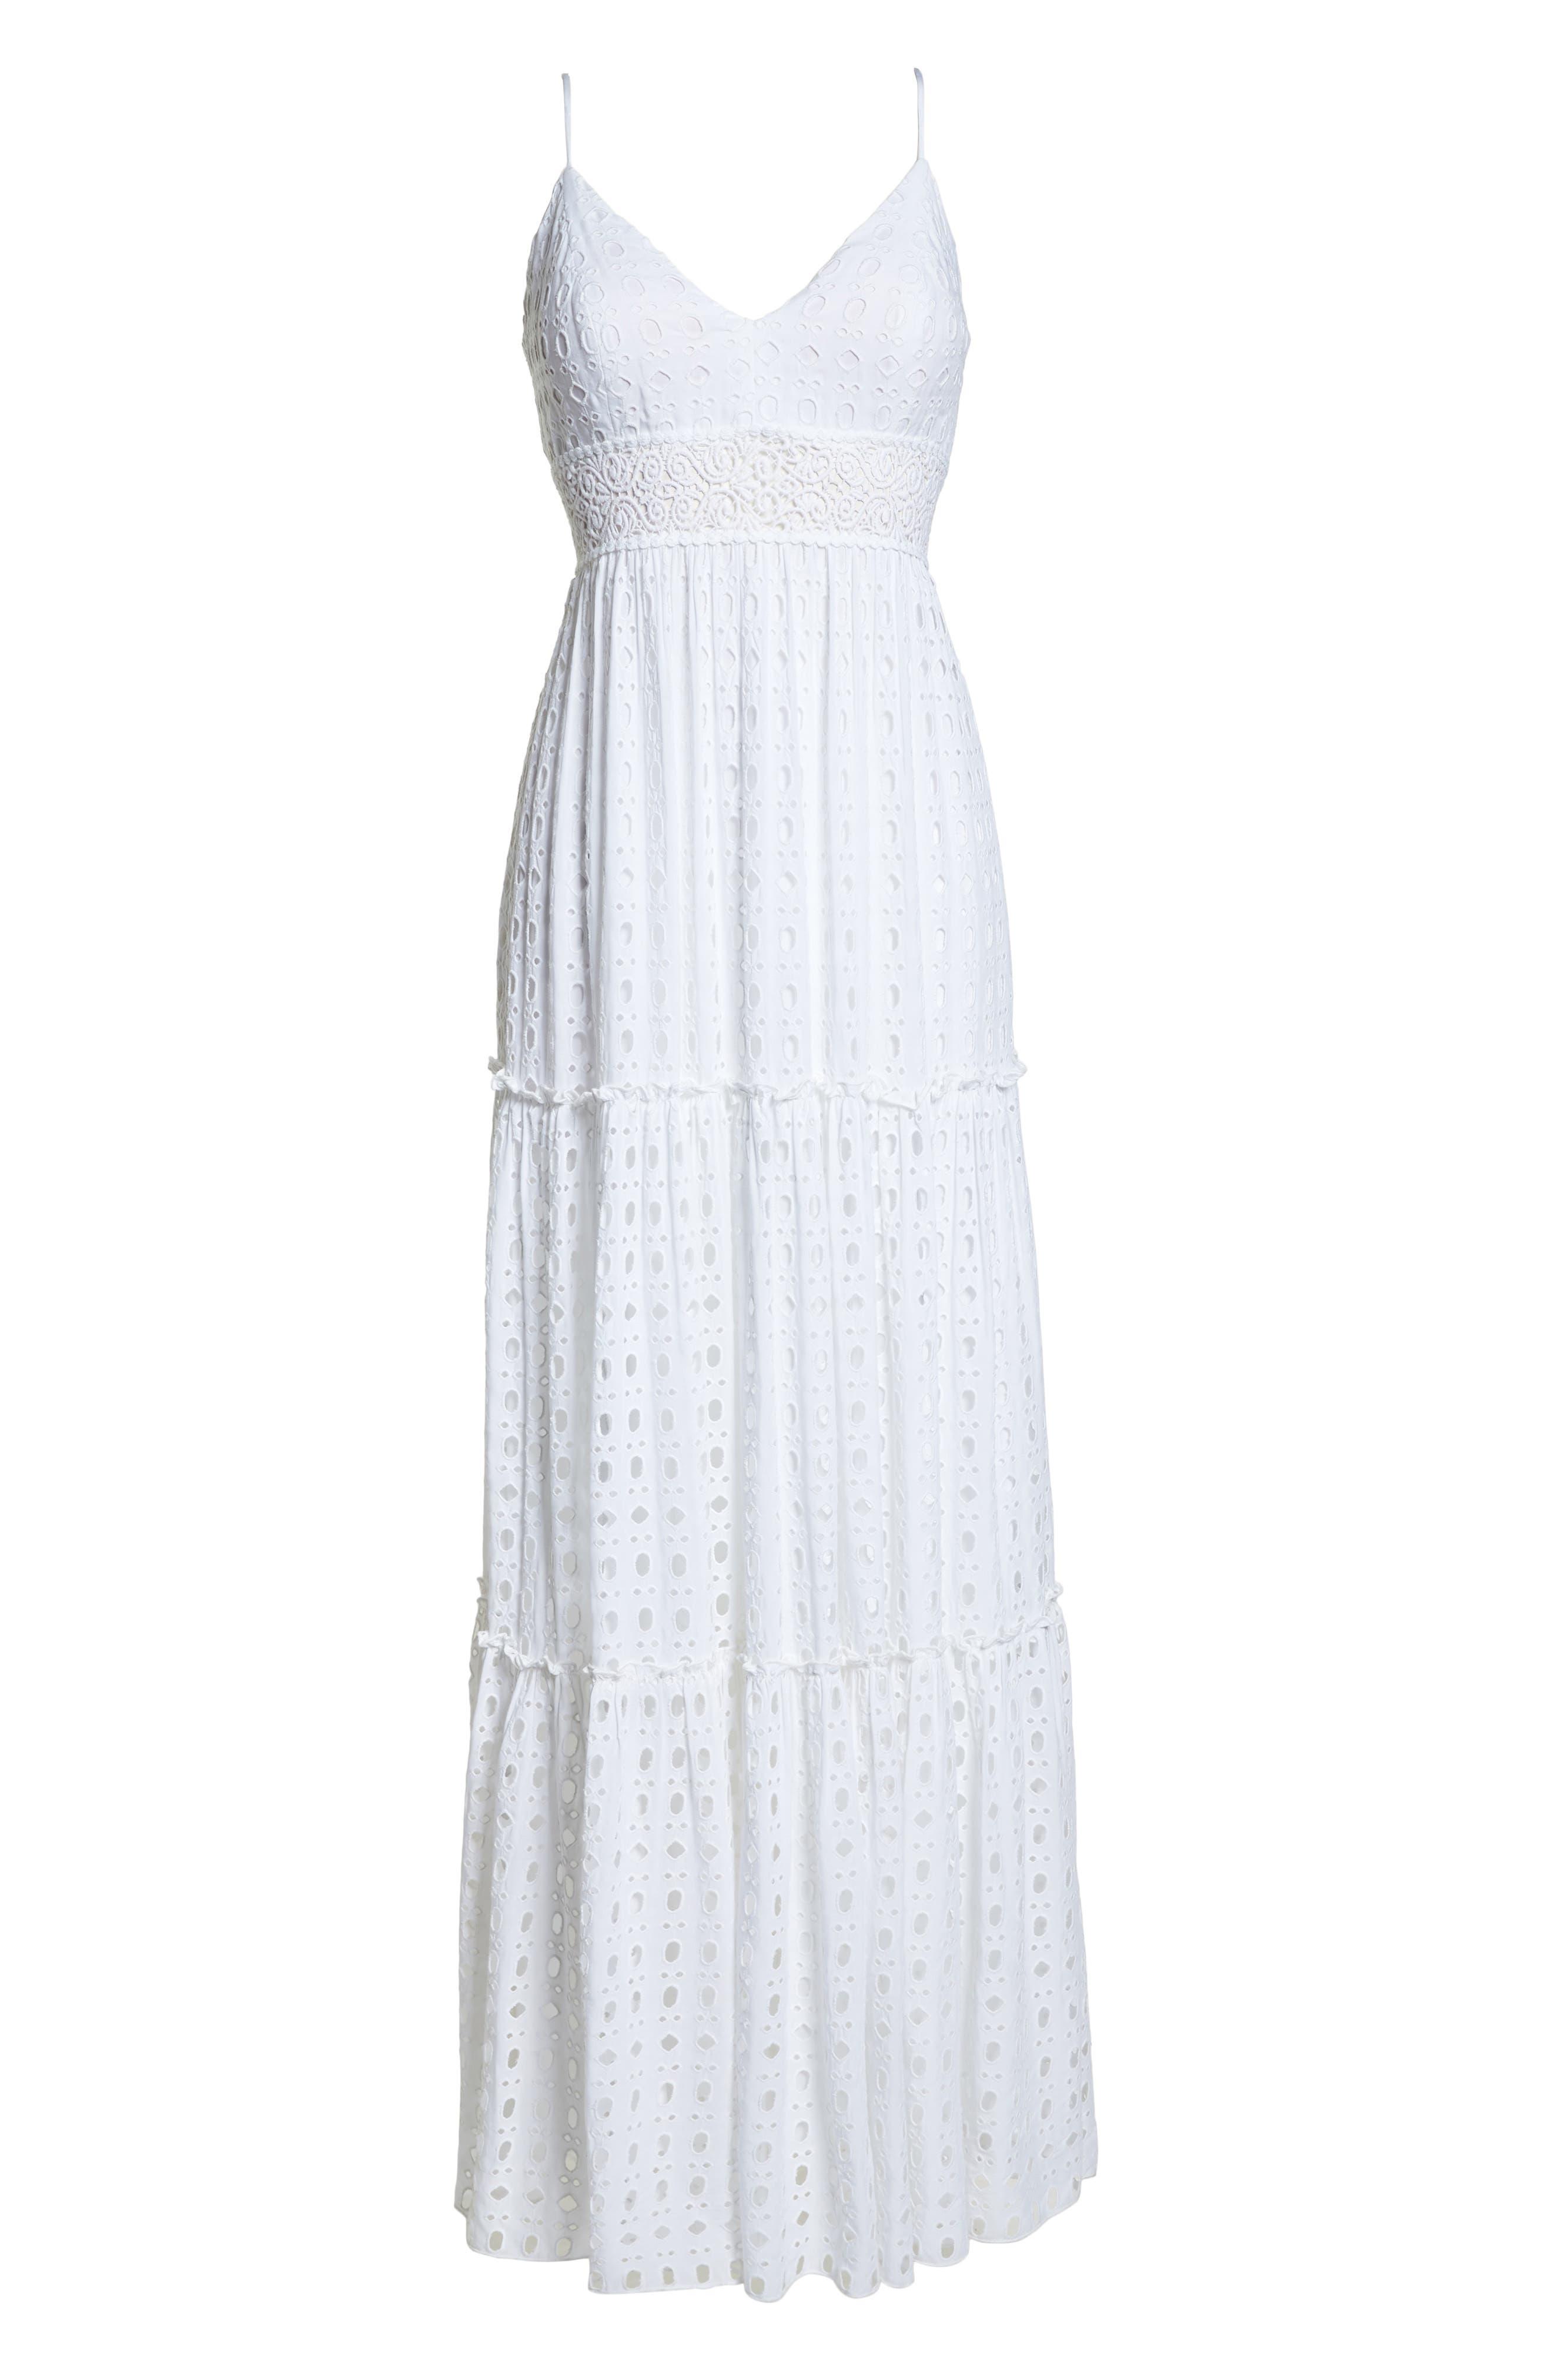 Melody Maxi Dress,                             Alternate thumbnail 6, color,                             Resort White Eyelet